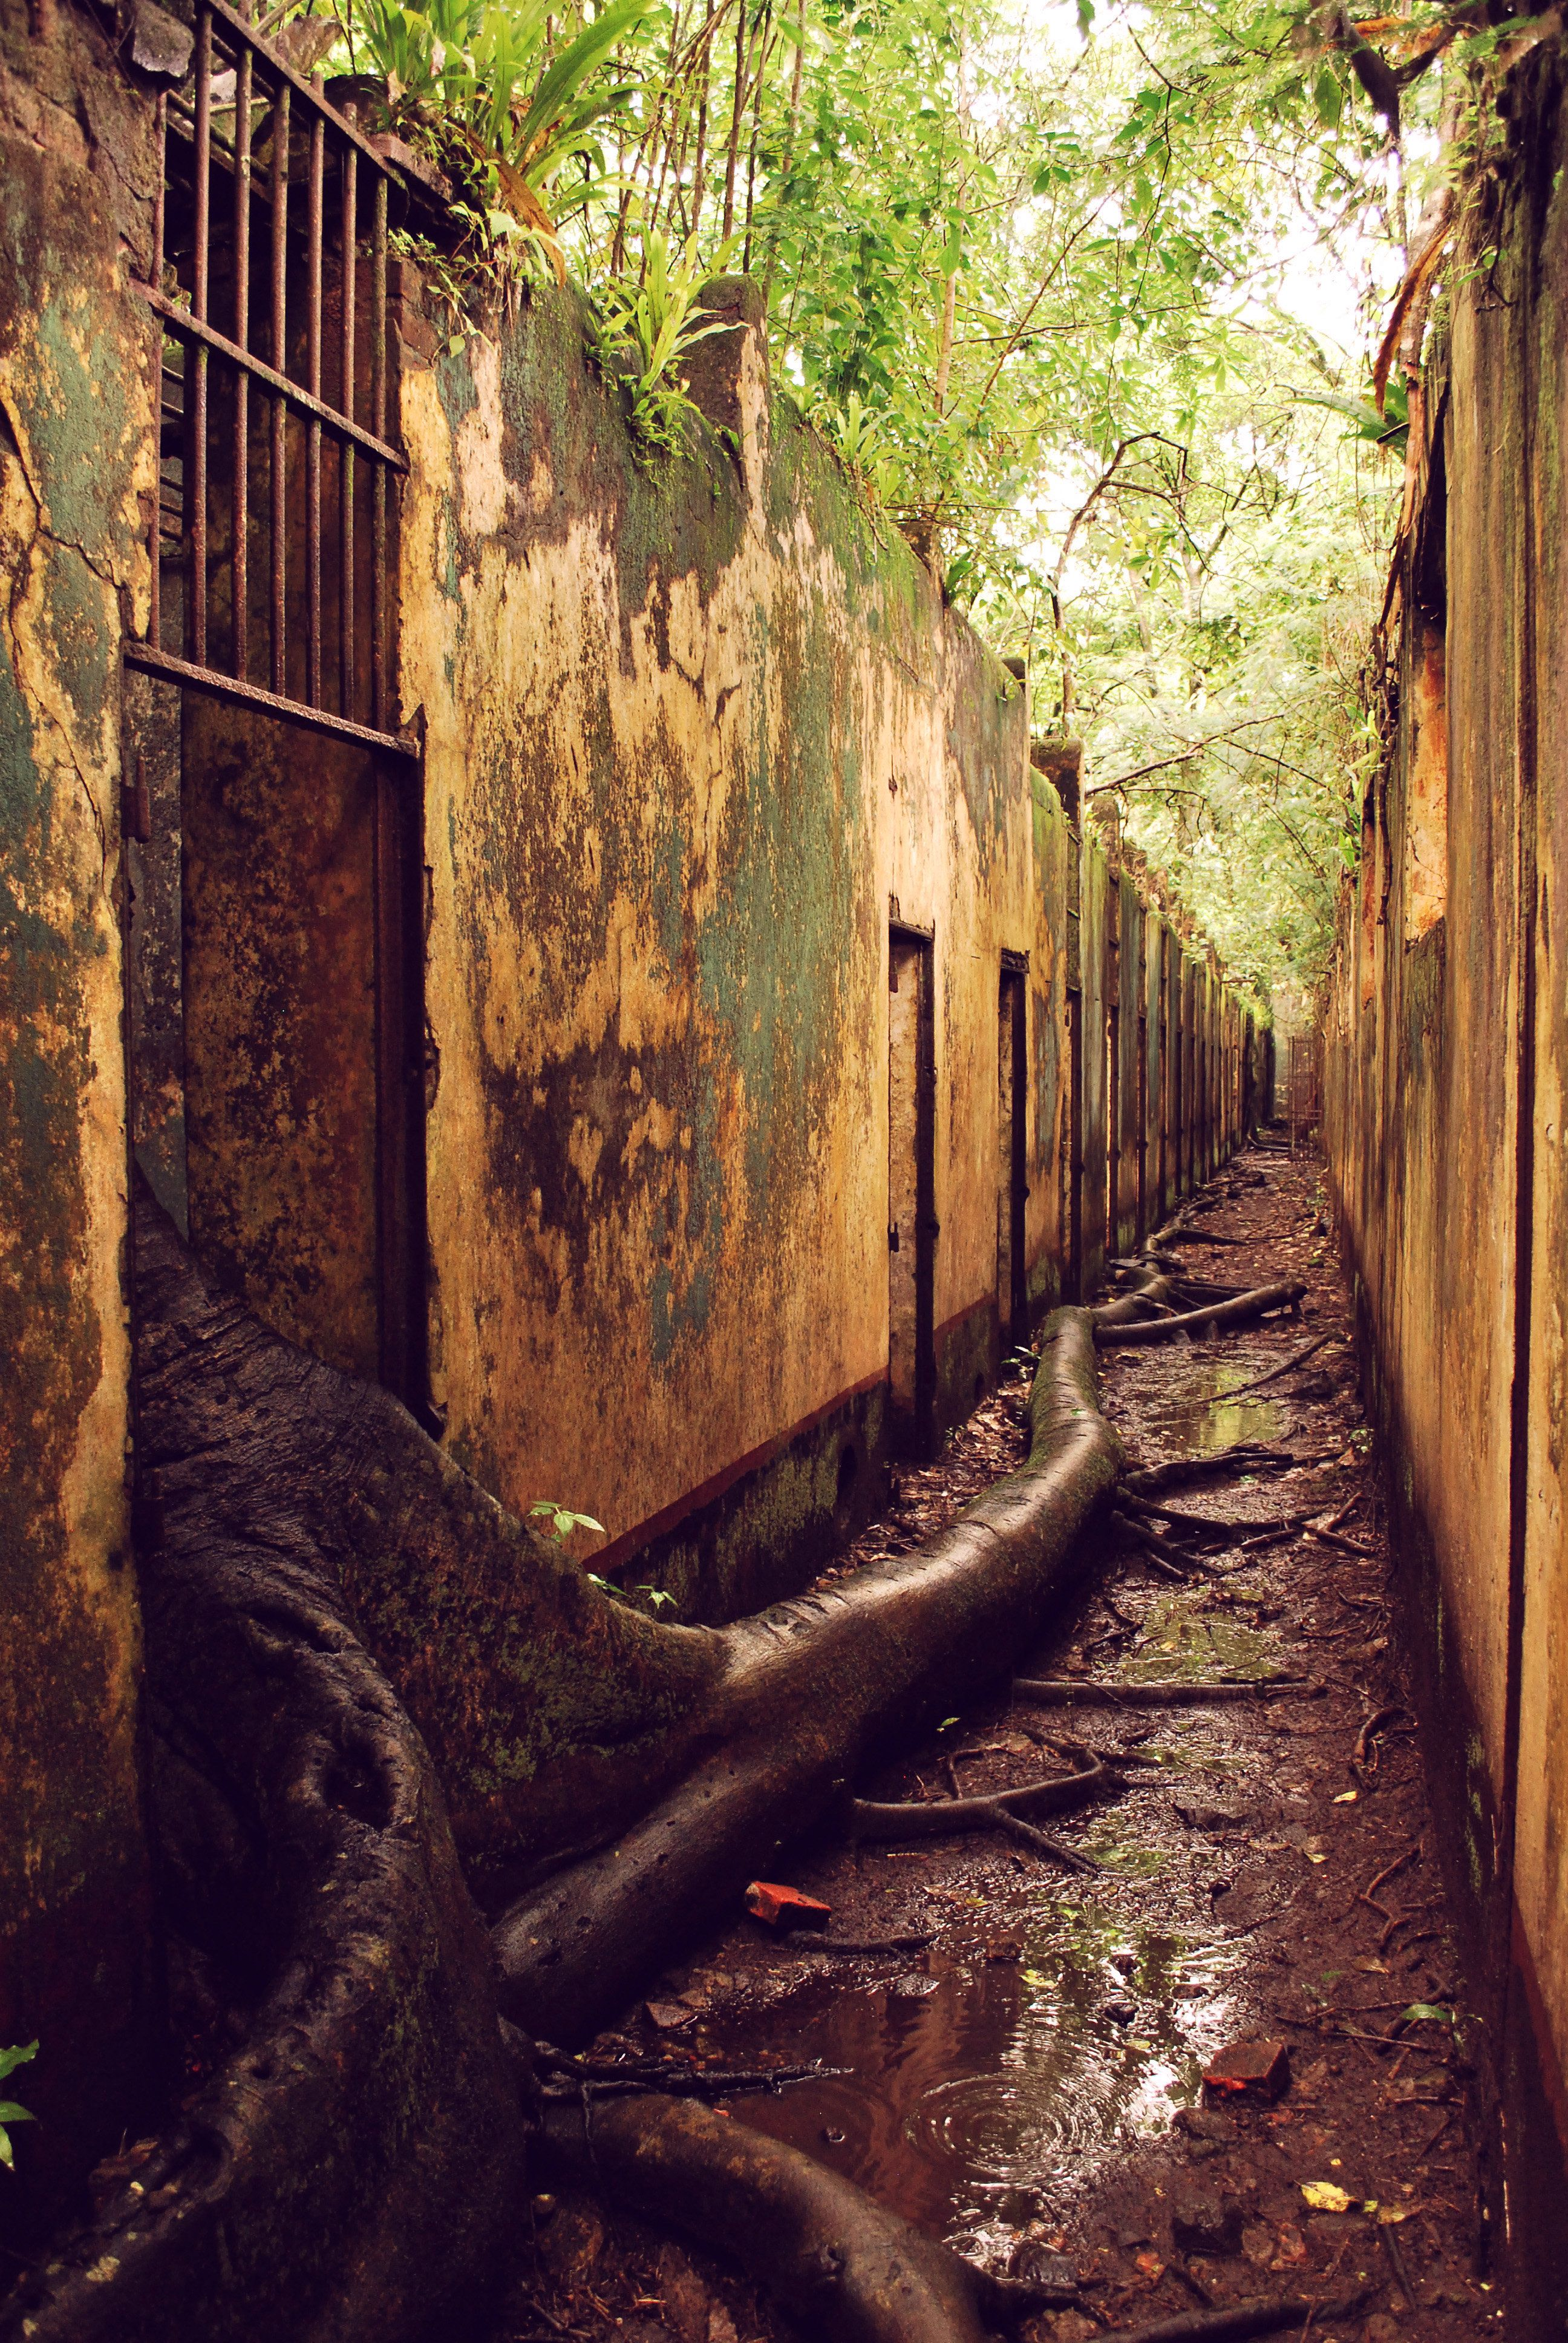 Devil's Island Prison. Devil's Island in French Guiana was the real ...